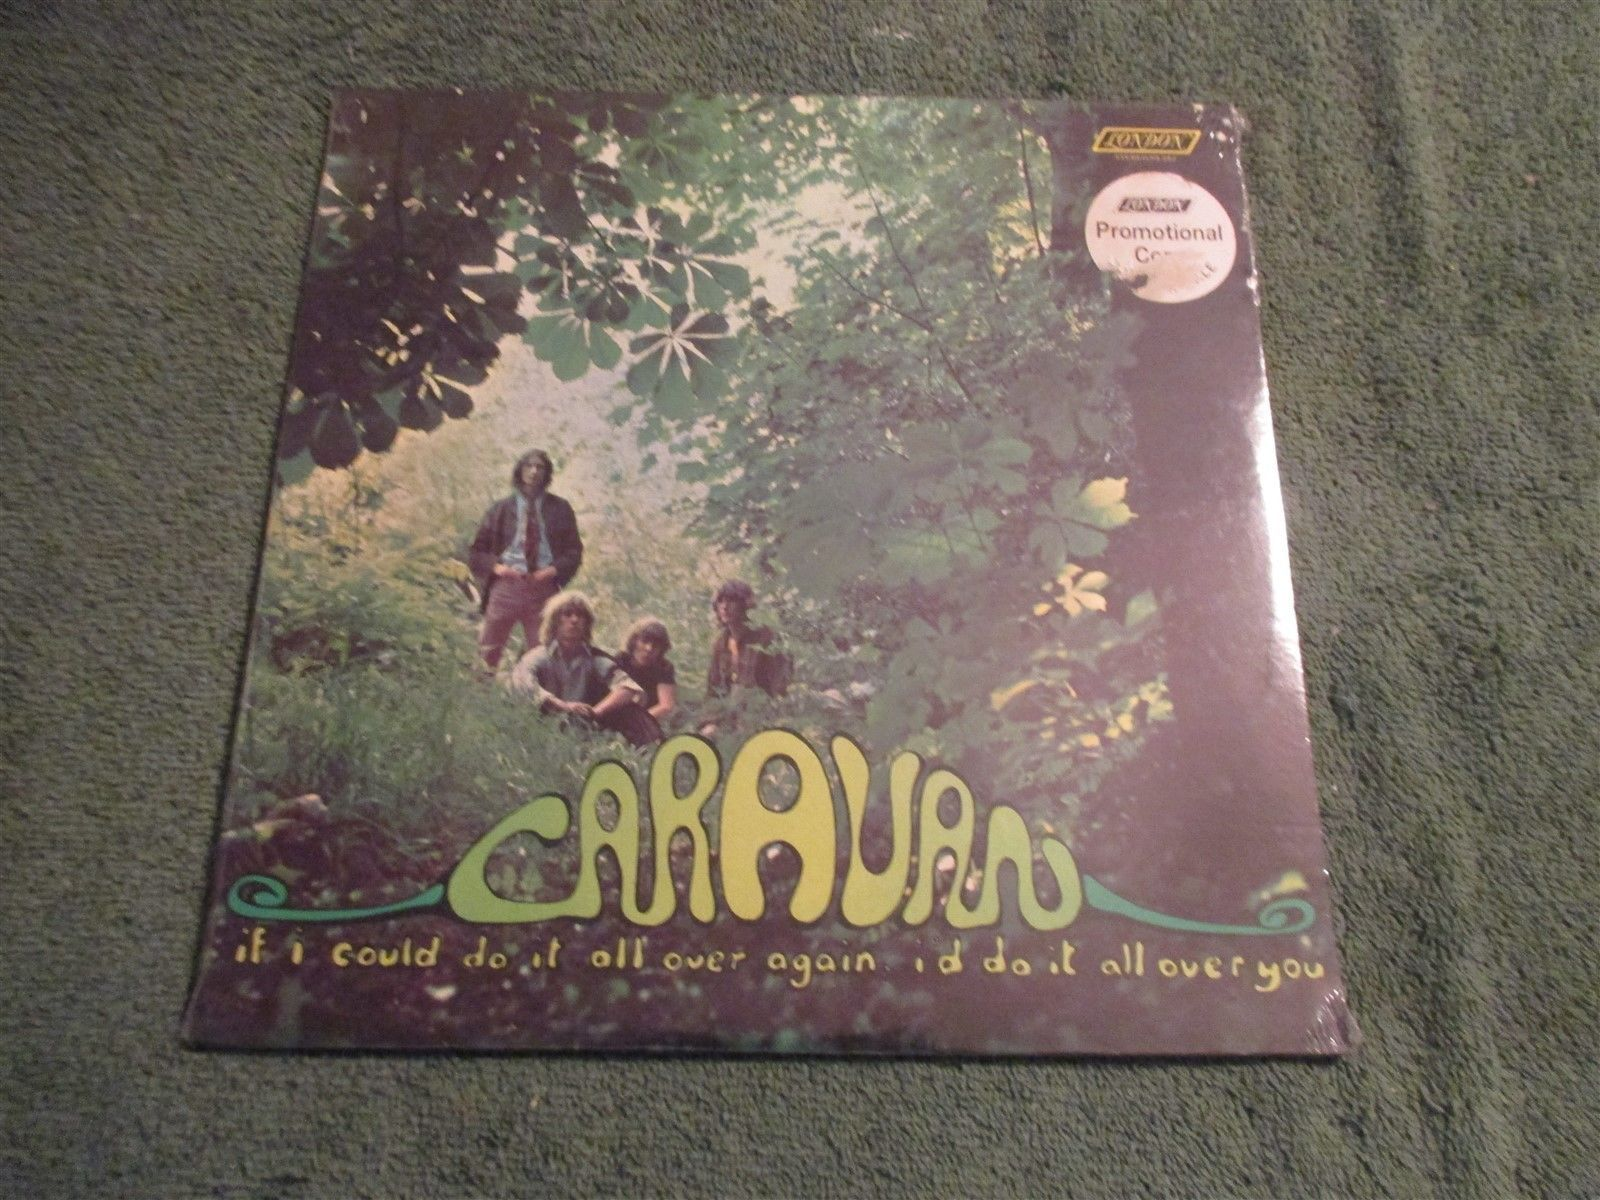 1970 SEALED PROG LP Caravan If I Could Do It All Over Again I'd Do It All Over https://t.co/hi64RLbuK4 https://t.co/bJButTLg8F